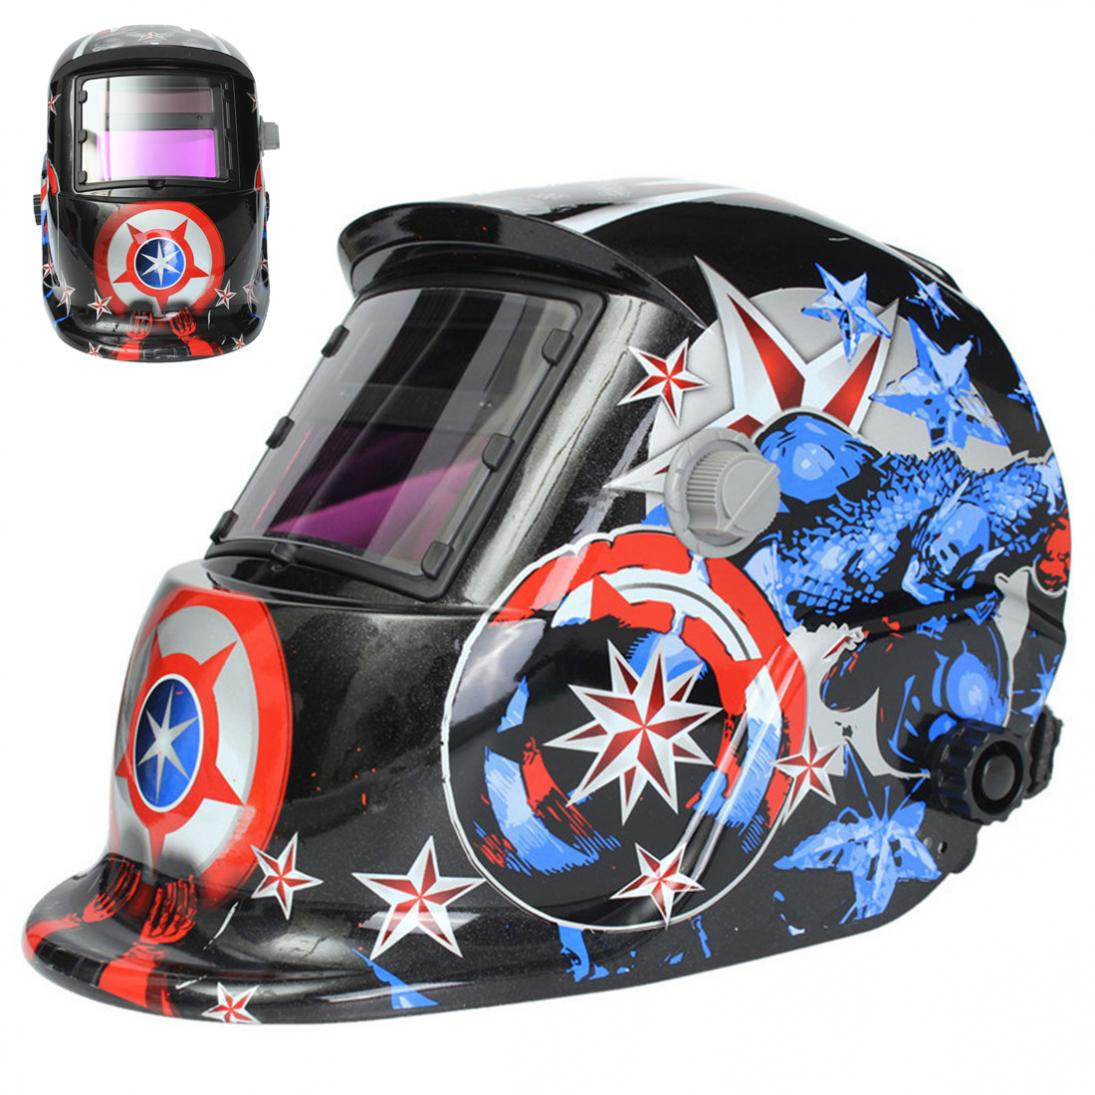 цена на Professional Solar Auto Darkening MIG MMA Electric Welding Mask/Helmet/Welding Lens for Welding Machine or Plasma Cutter